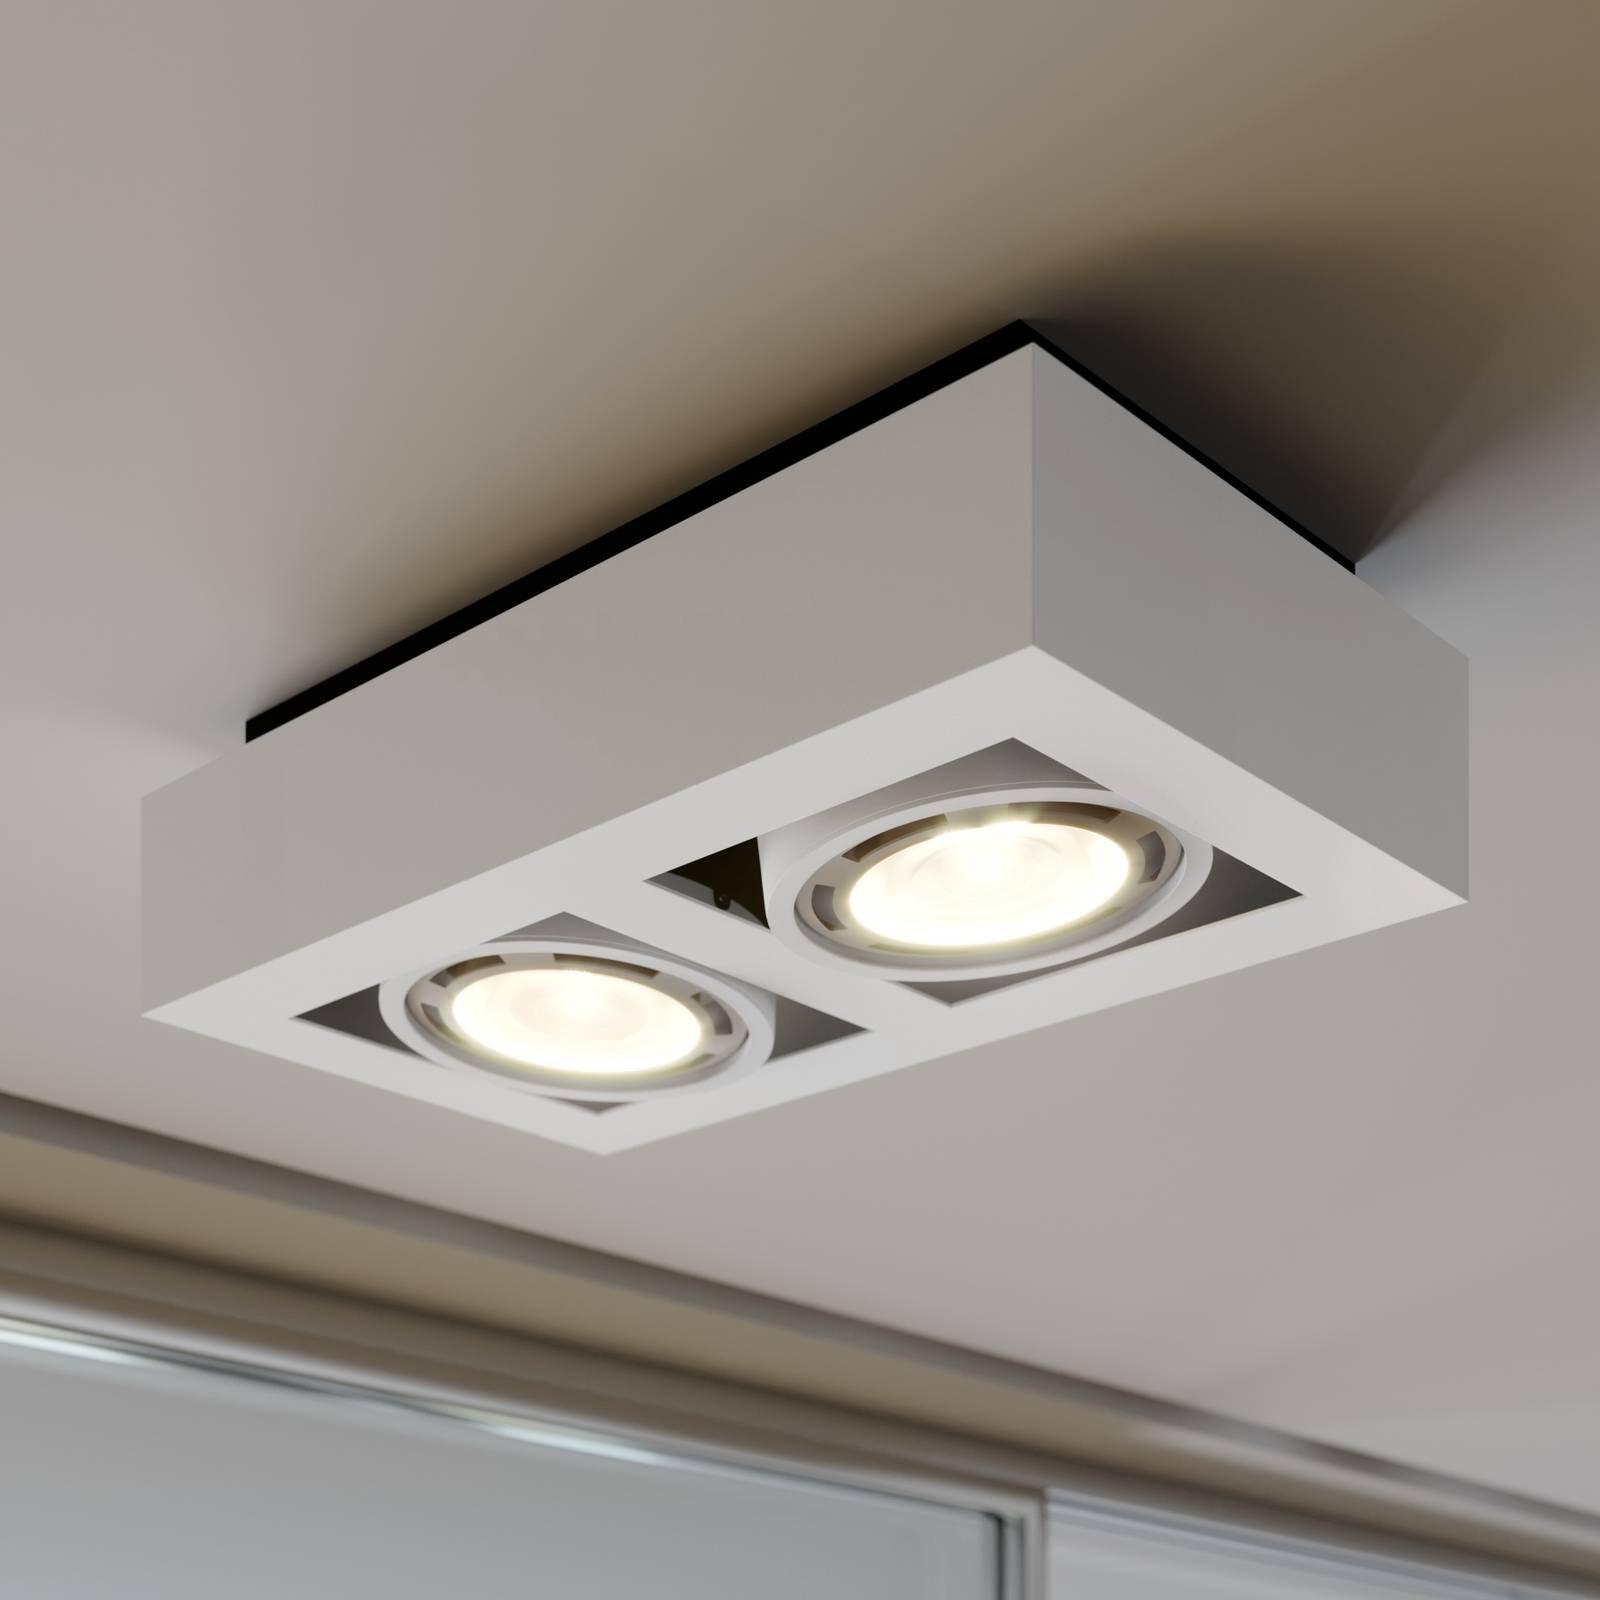 LED-takspot Ronka, GU10, 2 lyskilder, hvit